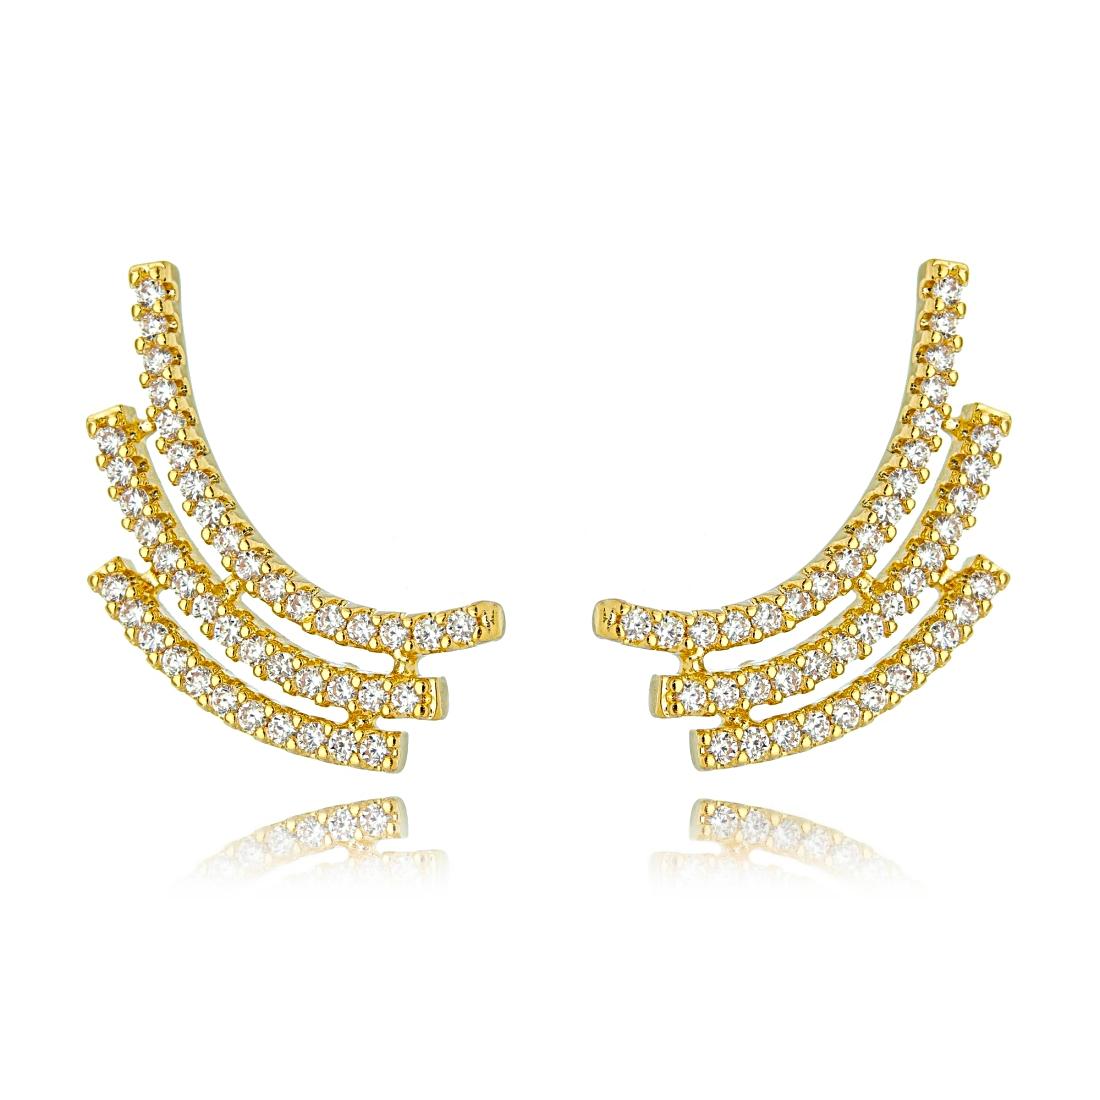 Ear Cuff Dourado Cravejado Zircônias Cristal Semijoia Fina Ouro  - Soloyou